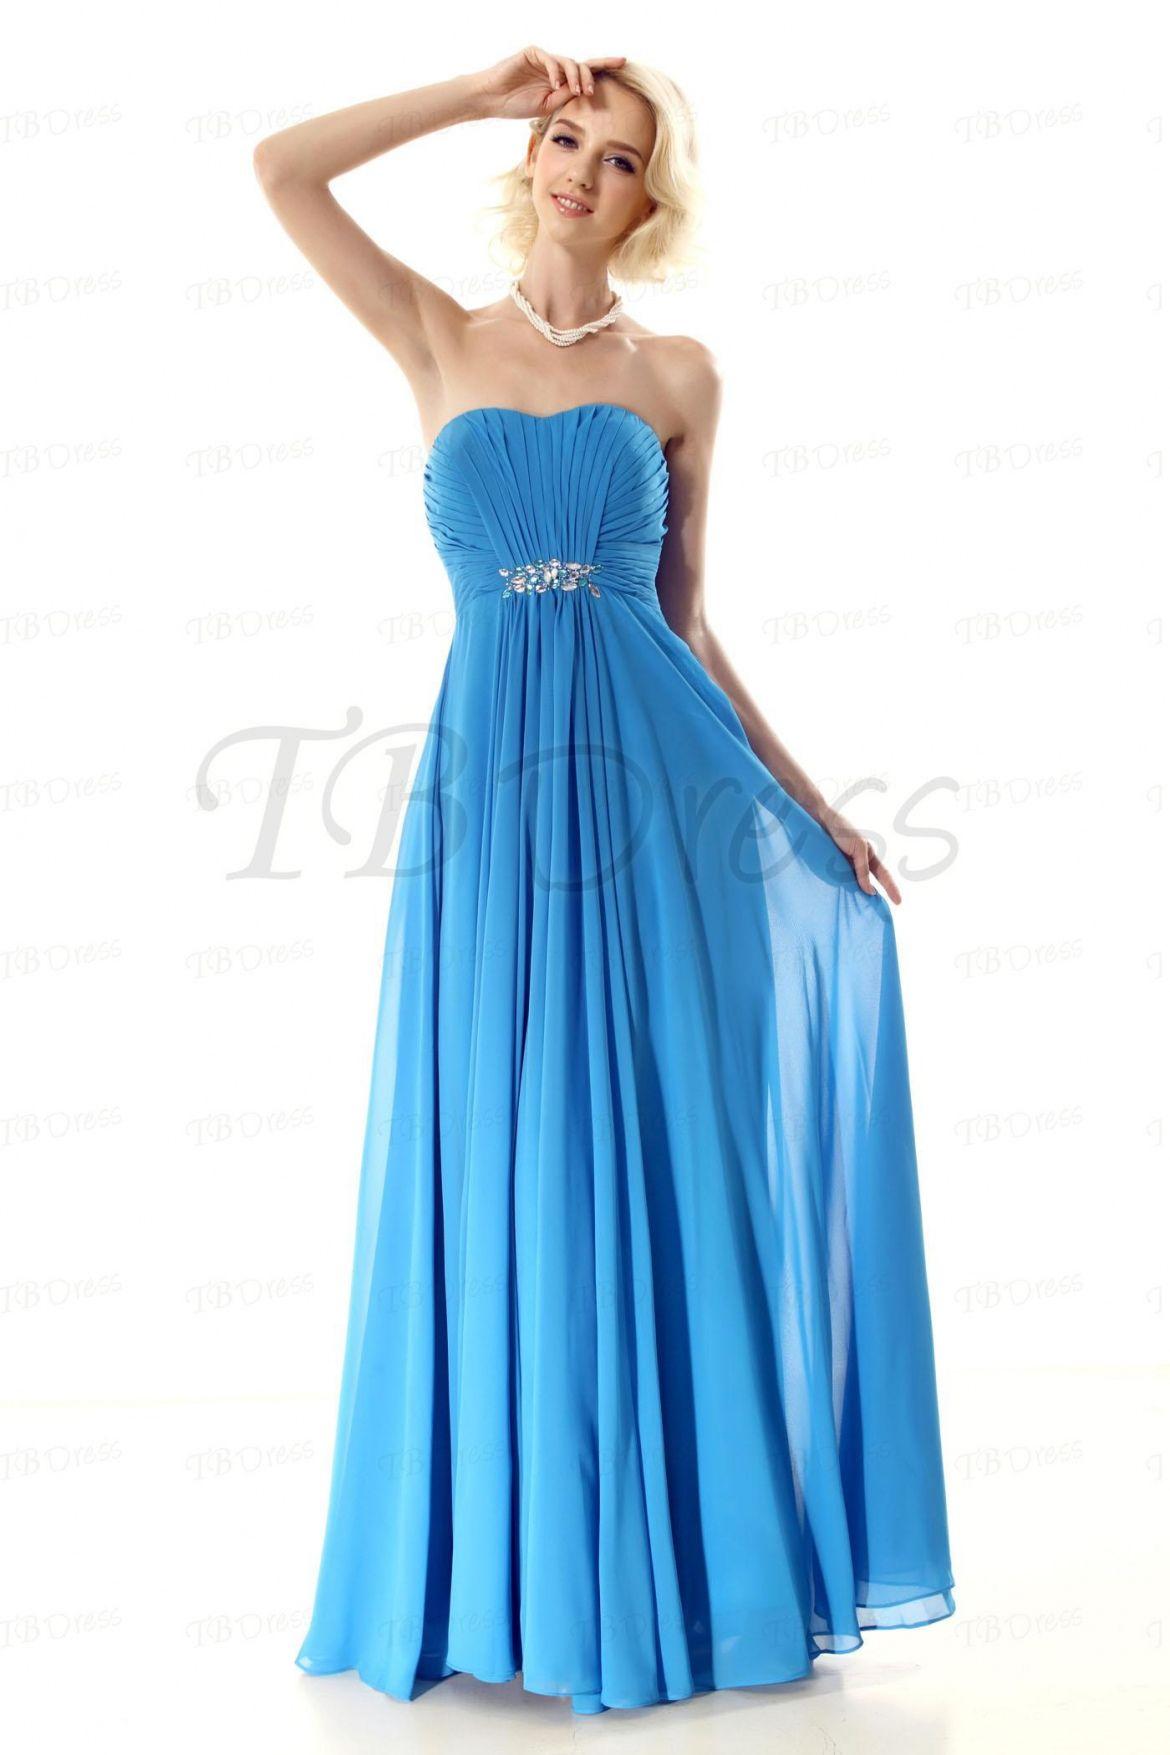 55+ Cheap Wedding Dresses Under 50 Dollars - Wedding Dresses for the ...